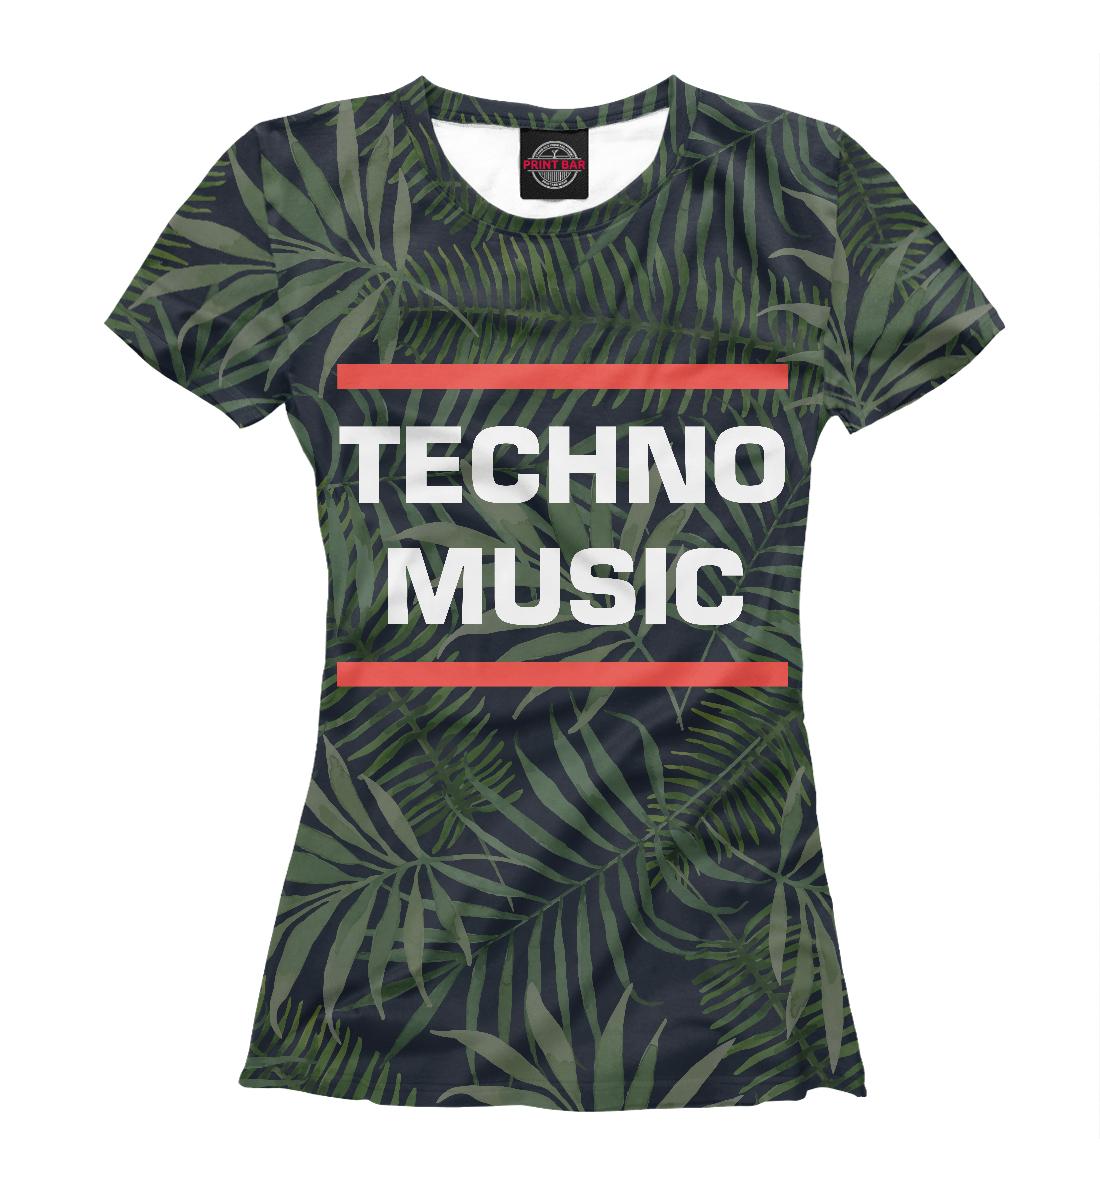 Techno music mikael niemi popular music